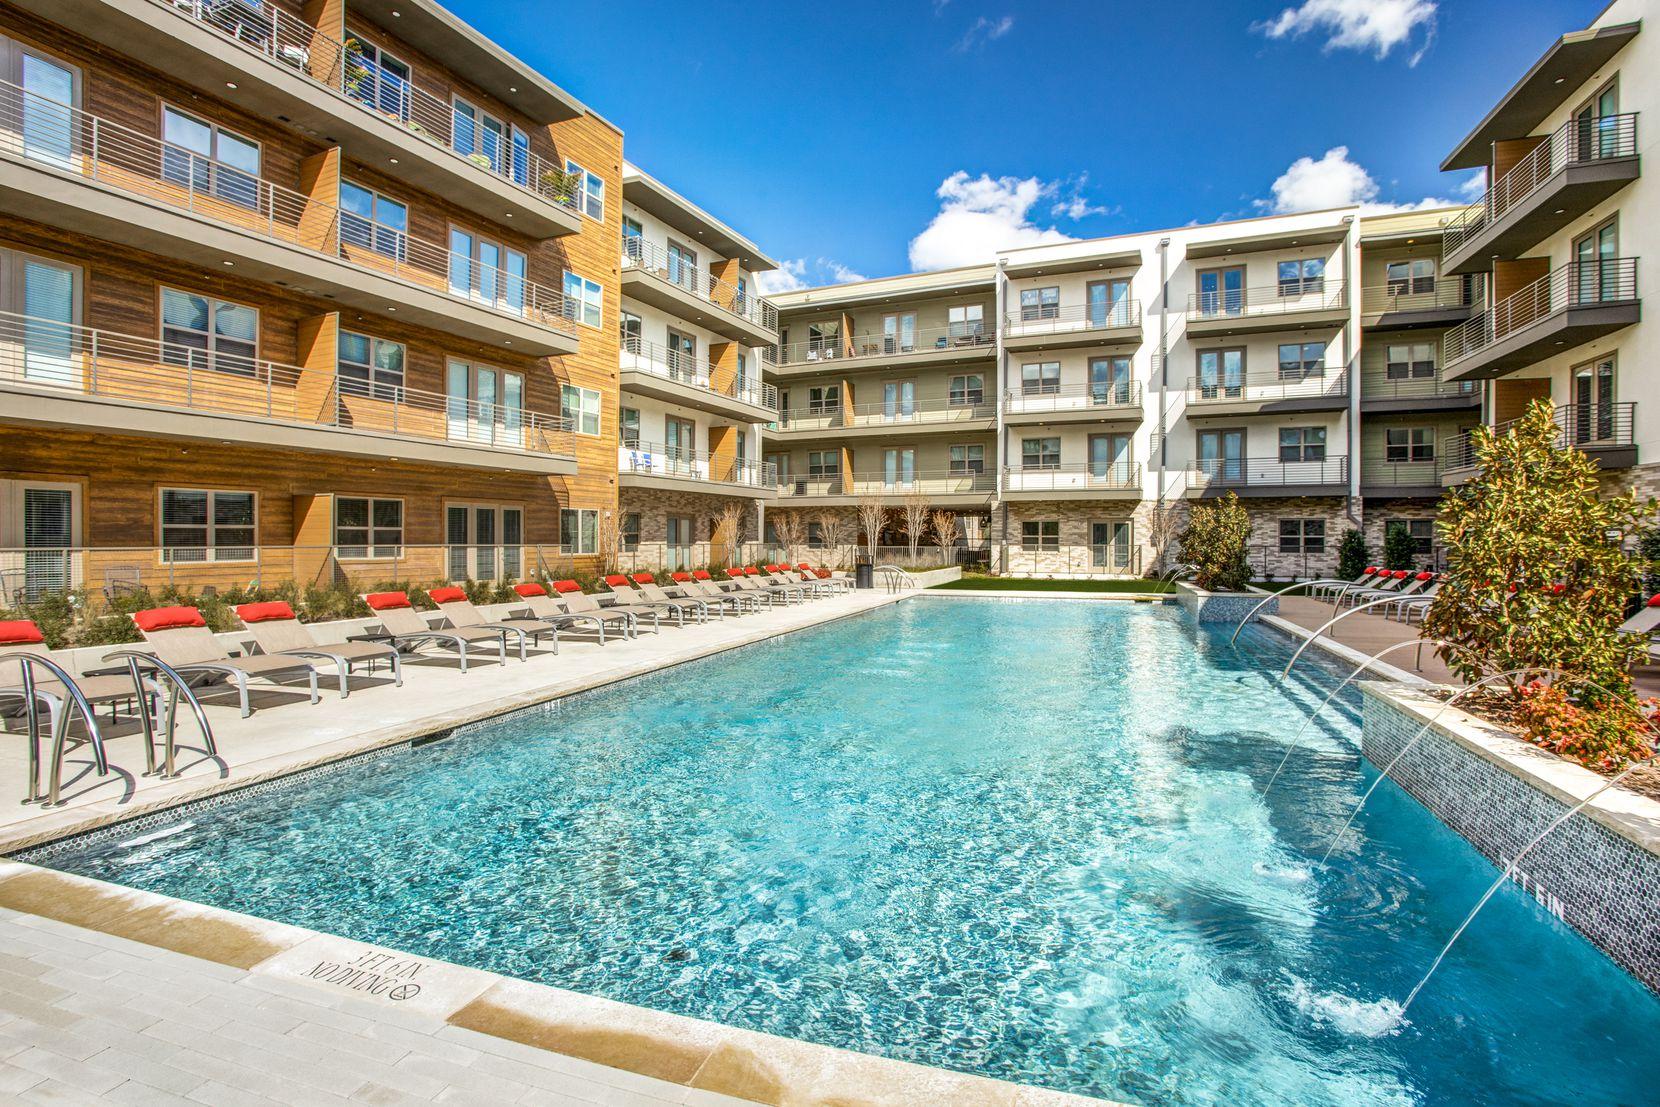 Bellevue at The Bluffs, a 473-unit apartment community near Dallas' Love Field sold.